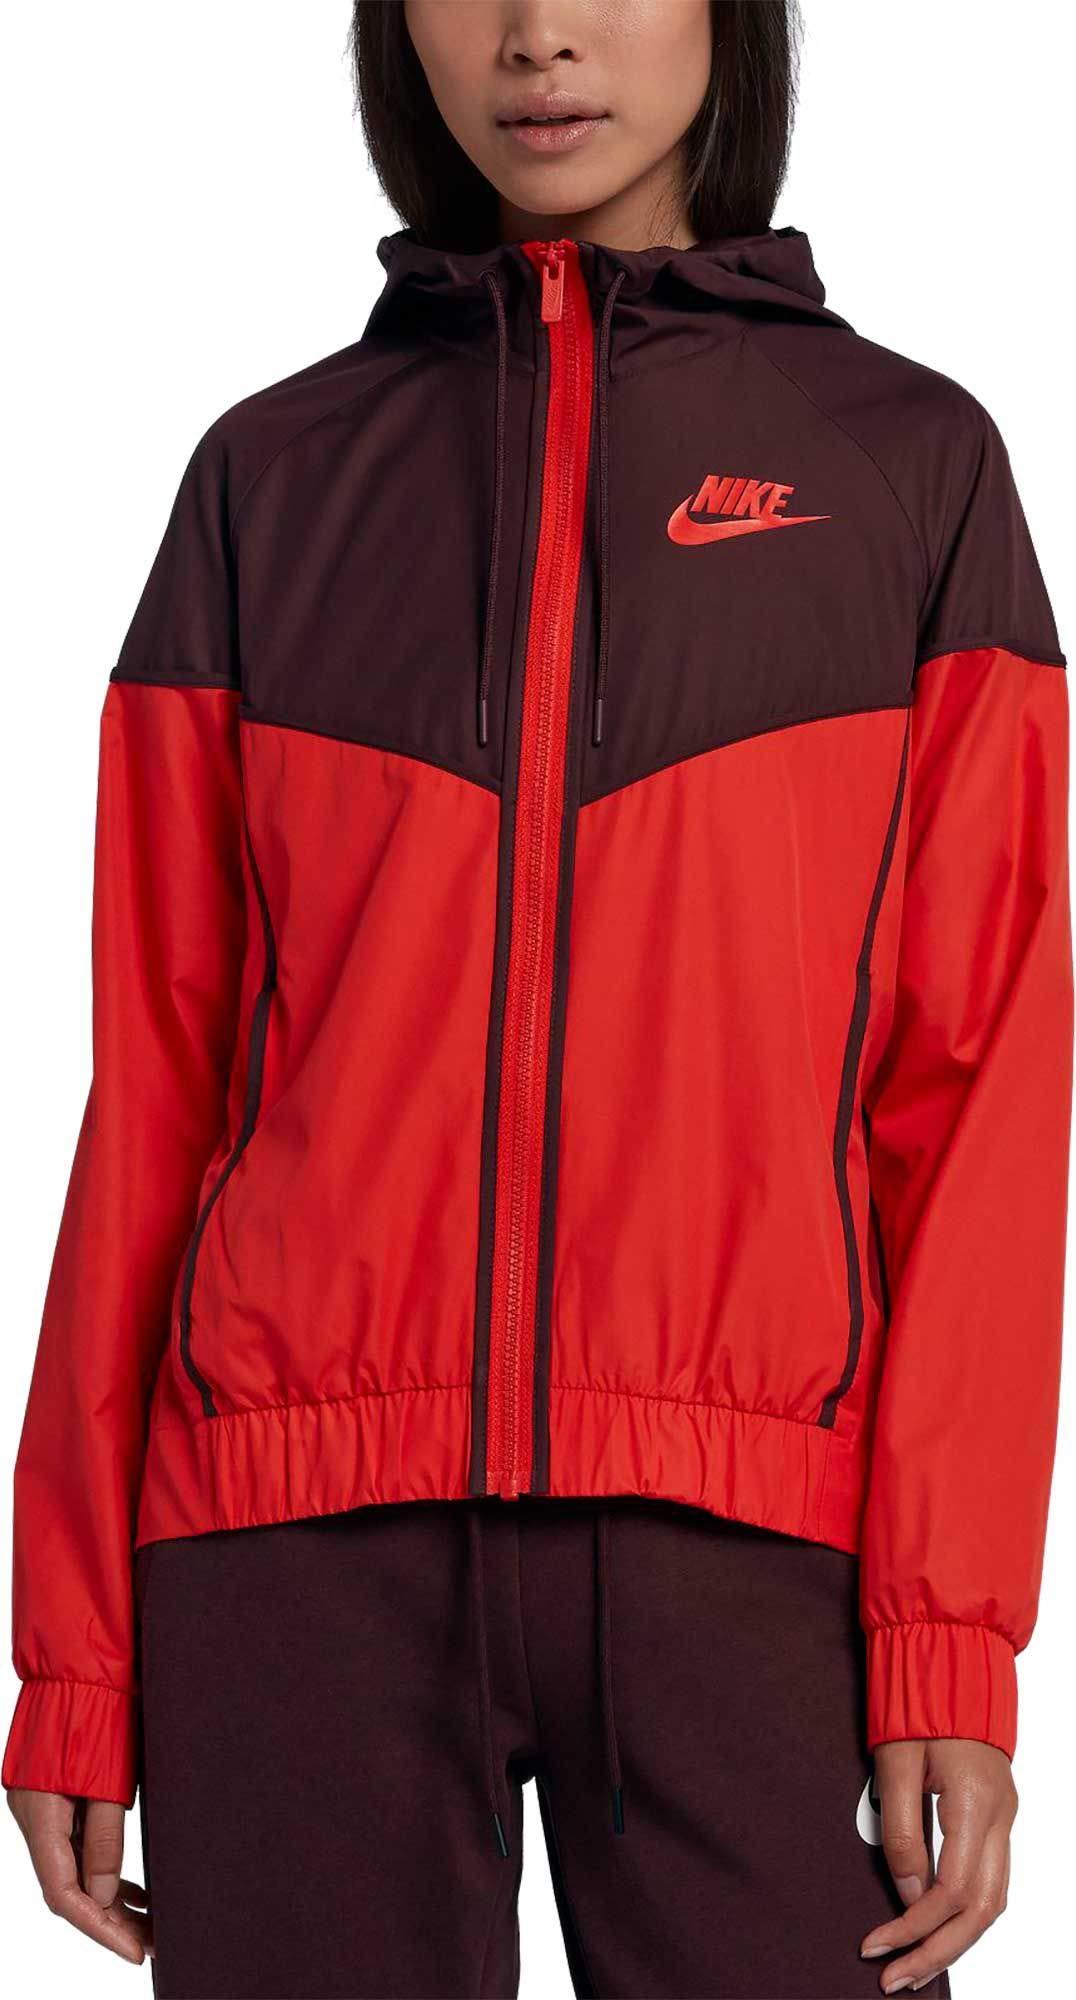 NIKE Women's Sportswear Windrunner Jacket (Habanero Red/Black, X-Small) by Nike (Image #1)